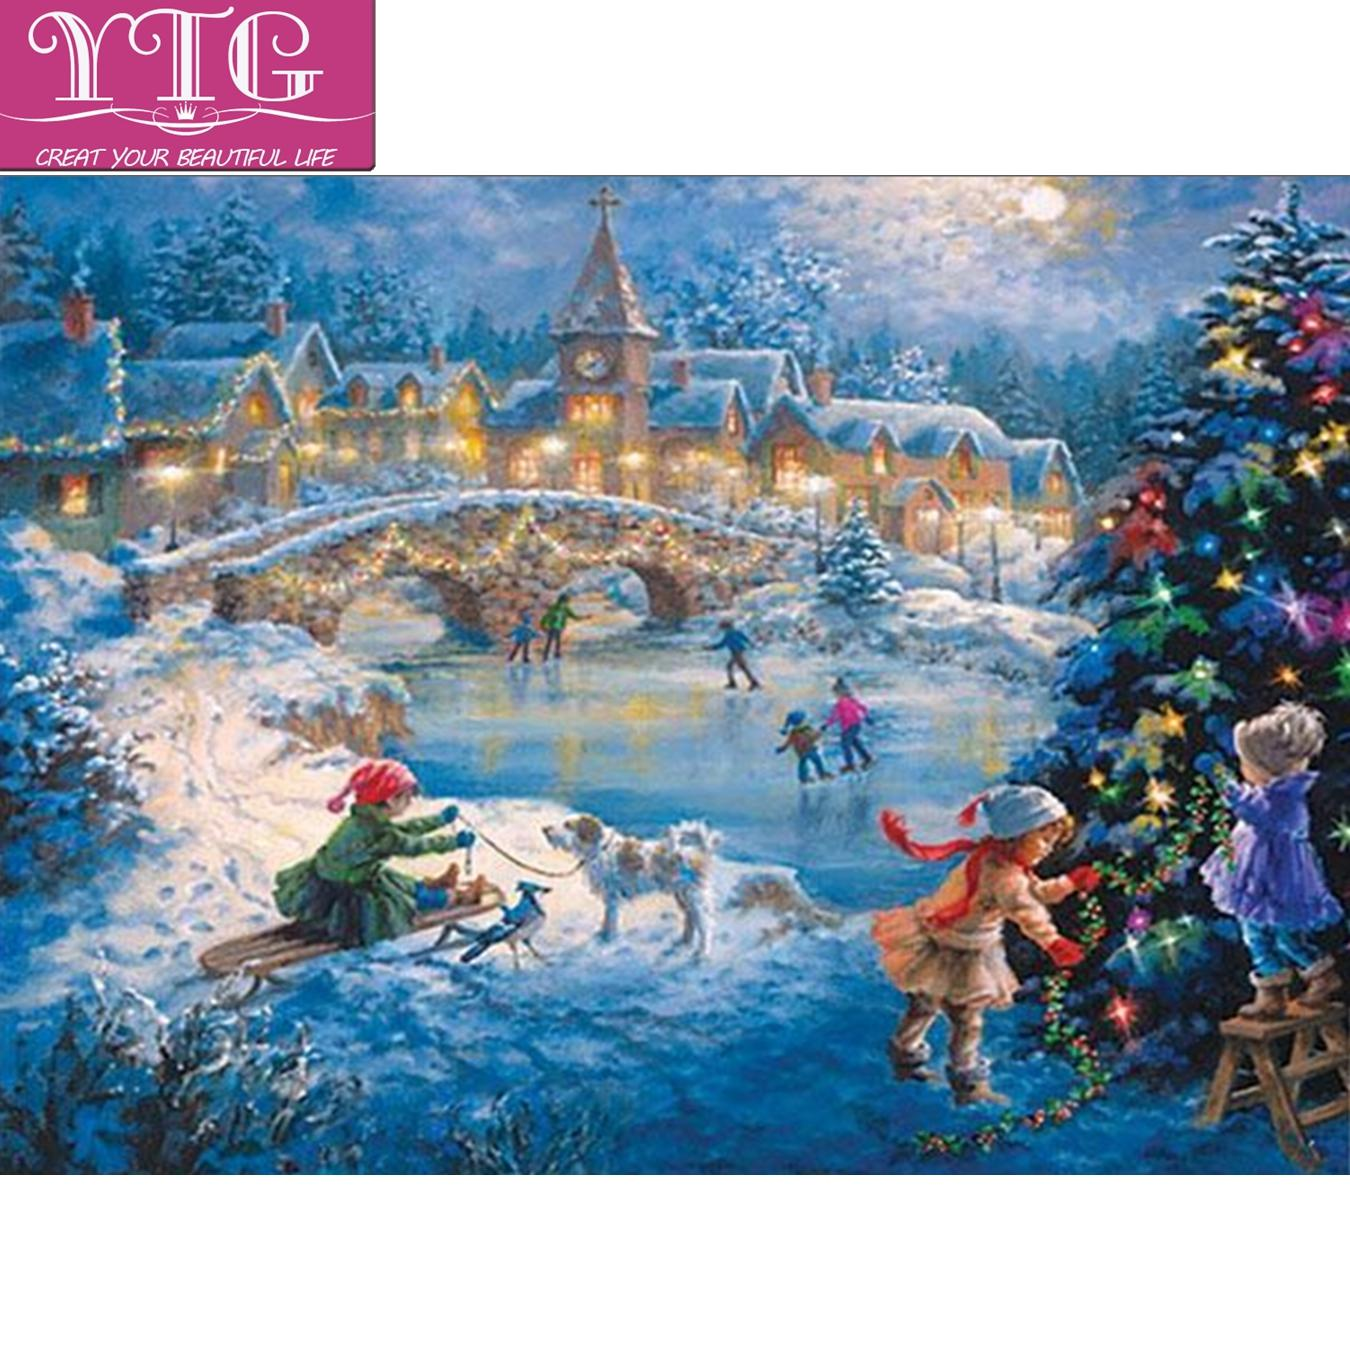 Christmas Snow.2019 Christmas Snow Scenery Diamond Embroidery Diamond Painting Full 5d Cross Stitch Mosaic Round Rhinestone Diy Home Decoration Gift From